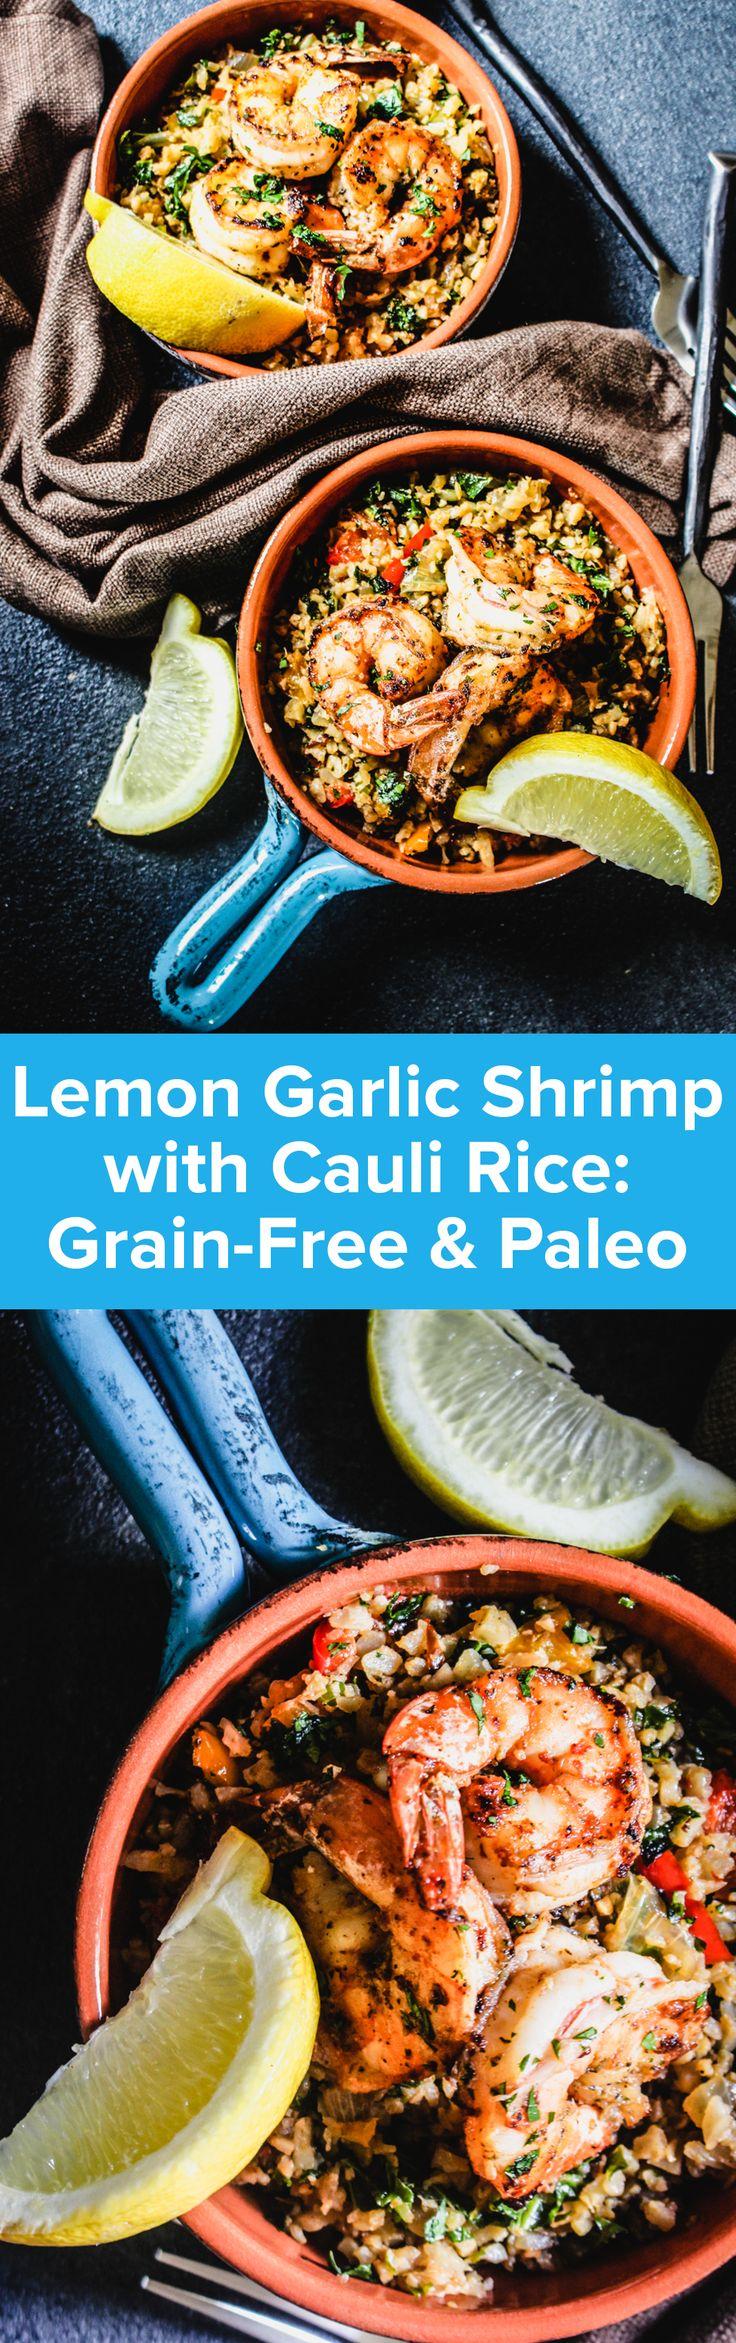 Lemon Garlic Shrimp with Cauliflower Rice Recipe   StupidEasyPaleo.com